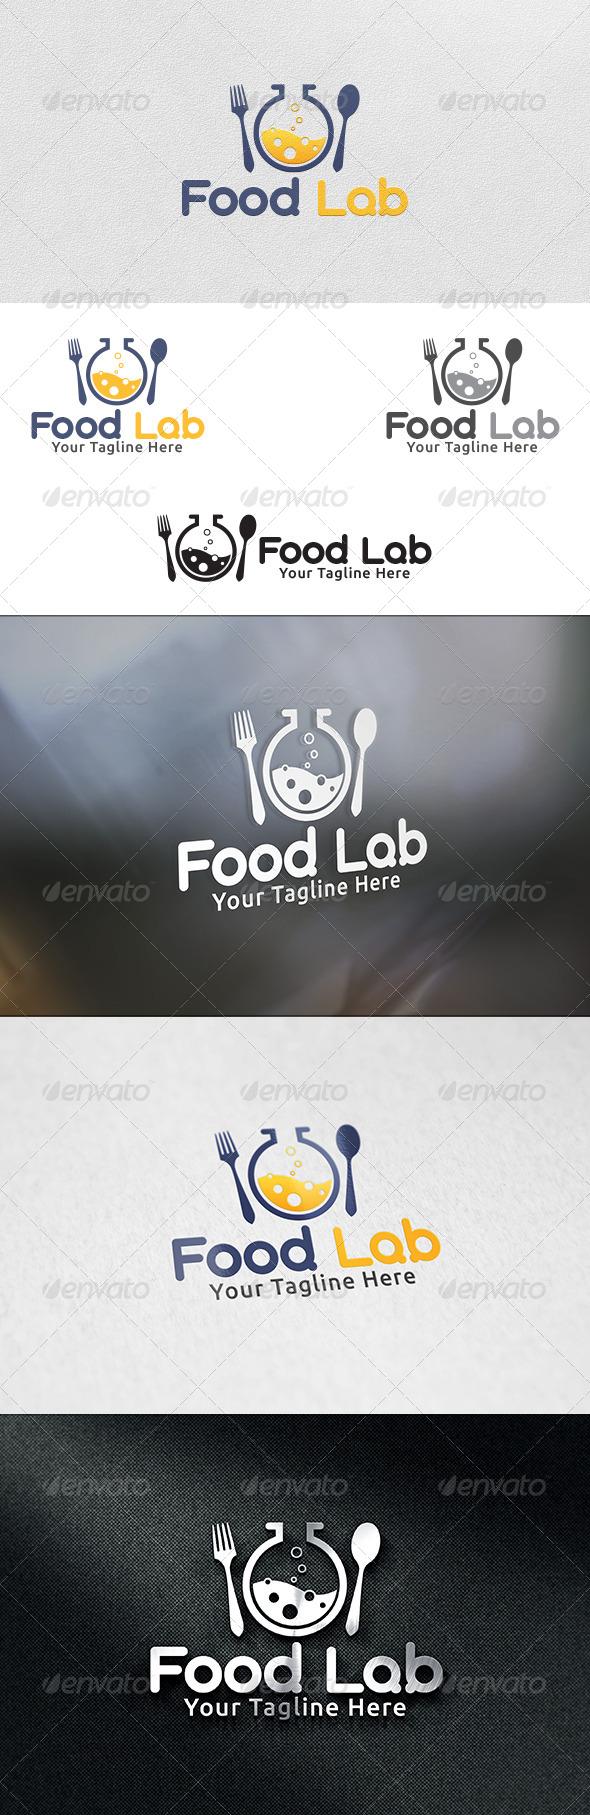 Food Lab - Logo Template - Food Logo Templates